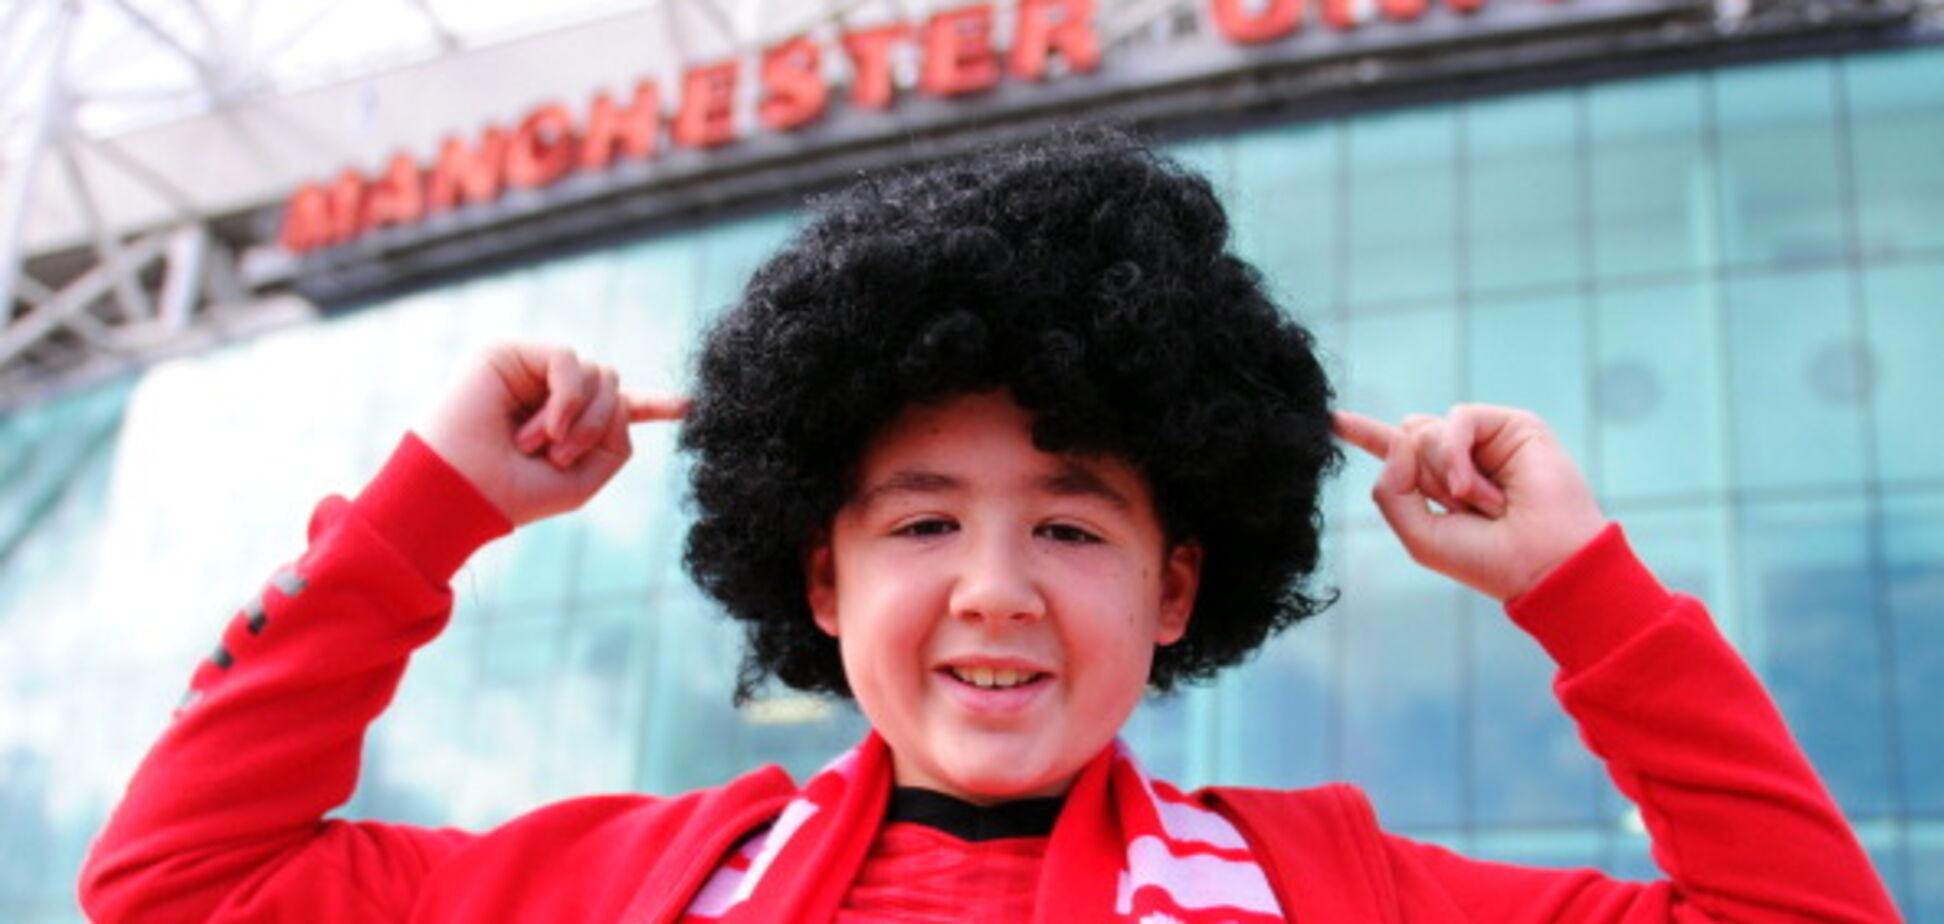 'Он совершенство': секс-символ 'Дома-2' засекли со звездой 'Манчестер Юнайтед'